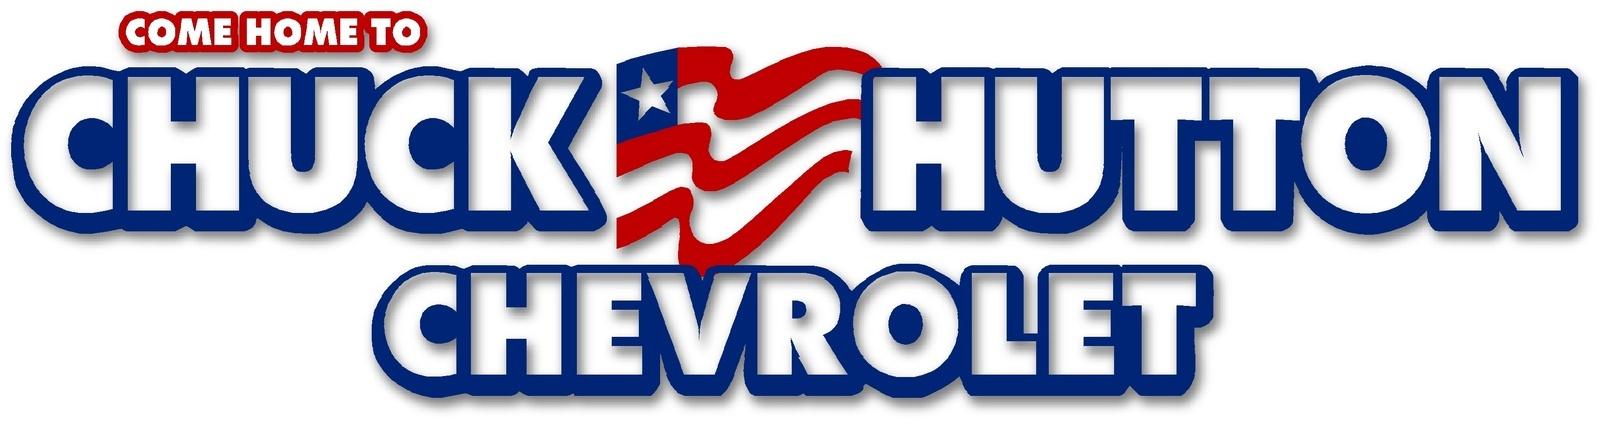 Chuck Hutton Chevrolet Co. - Memphis, TN: Read Consumer ...